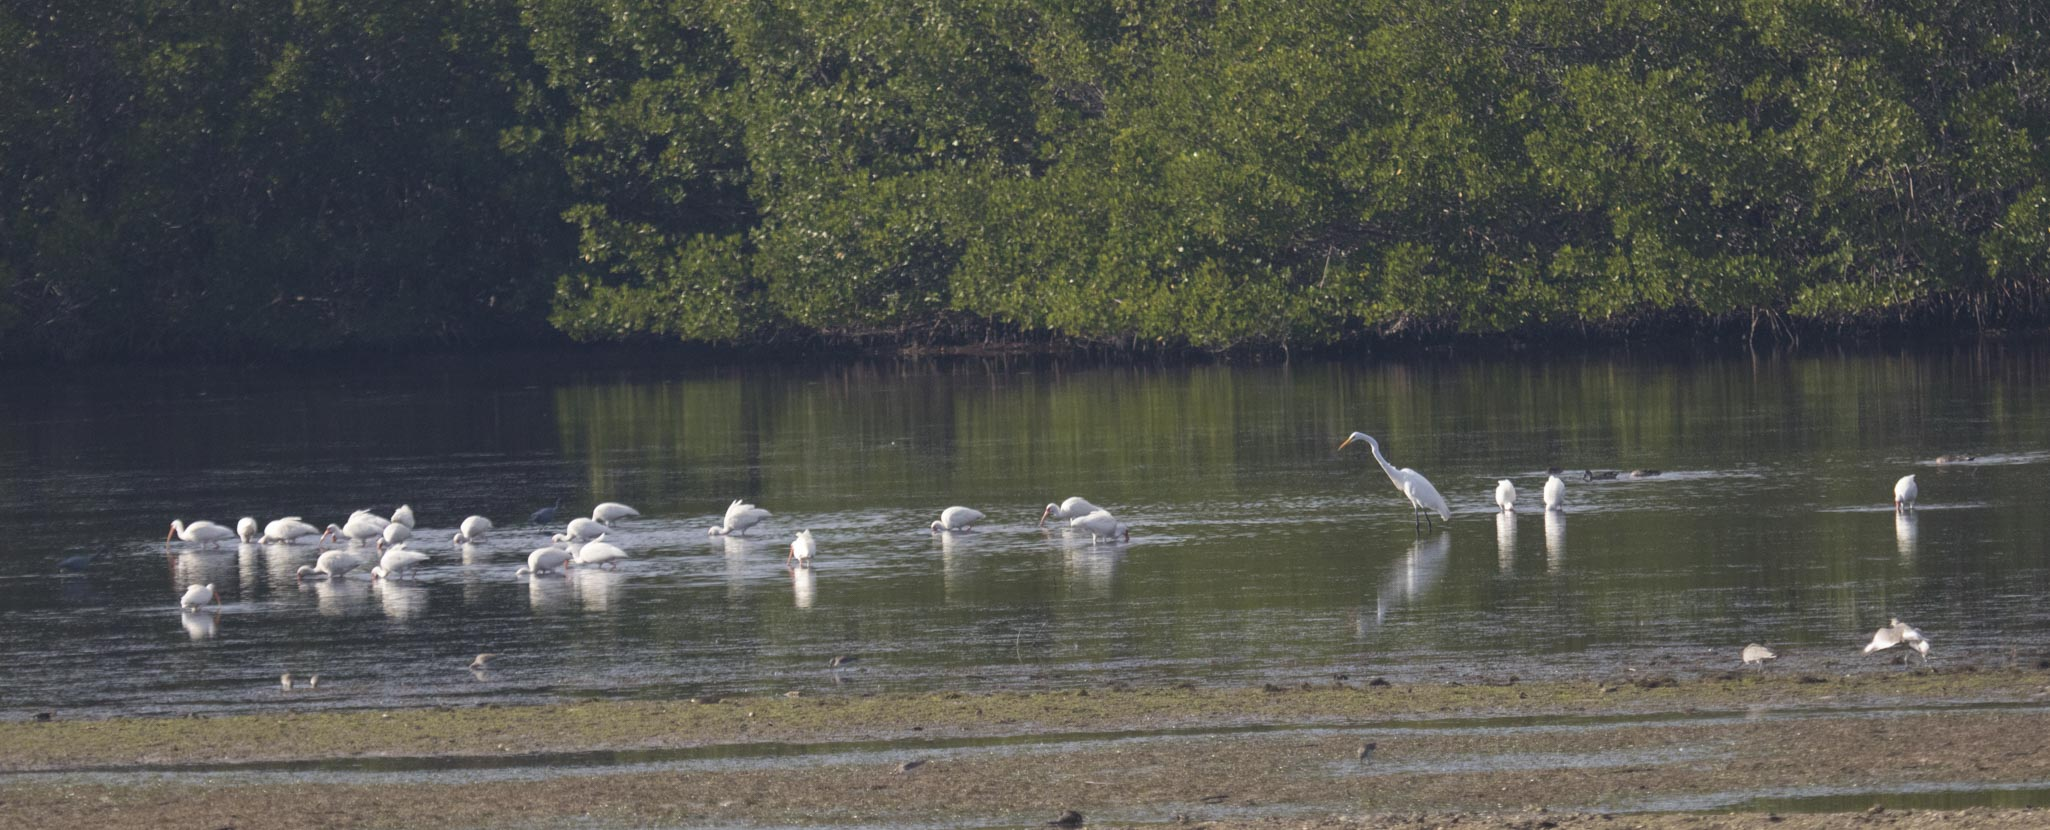 1128 Flock (1 of 1)